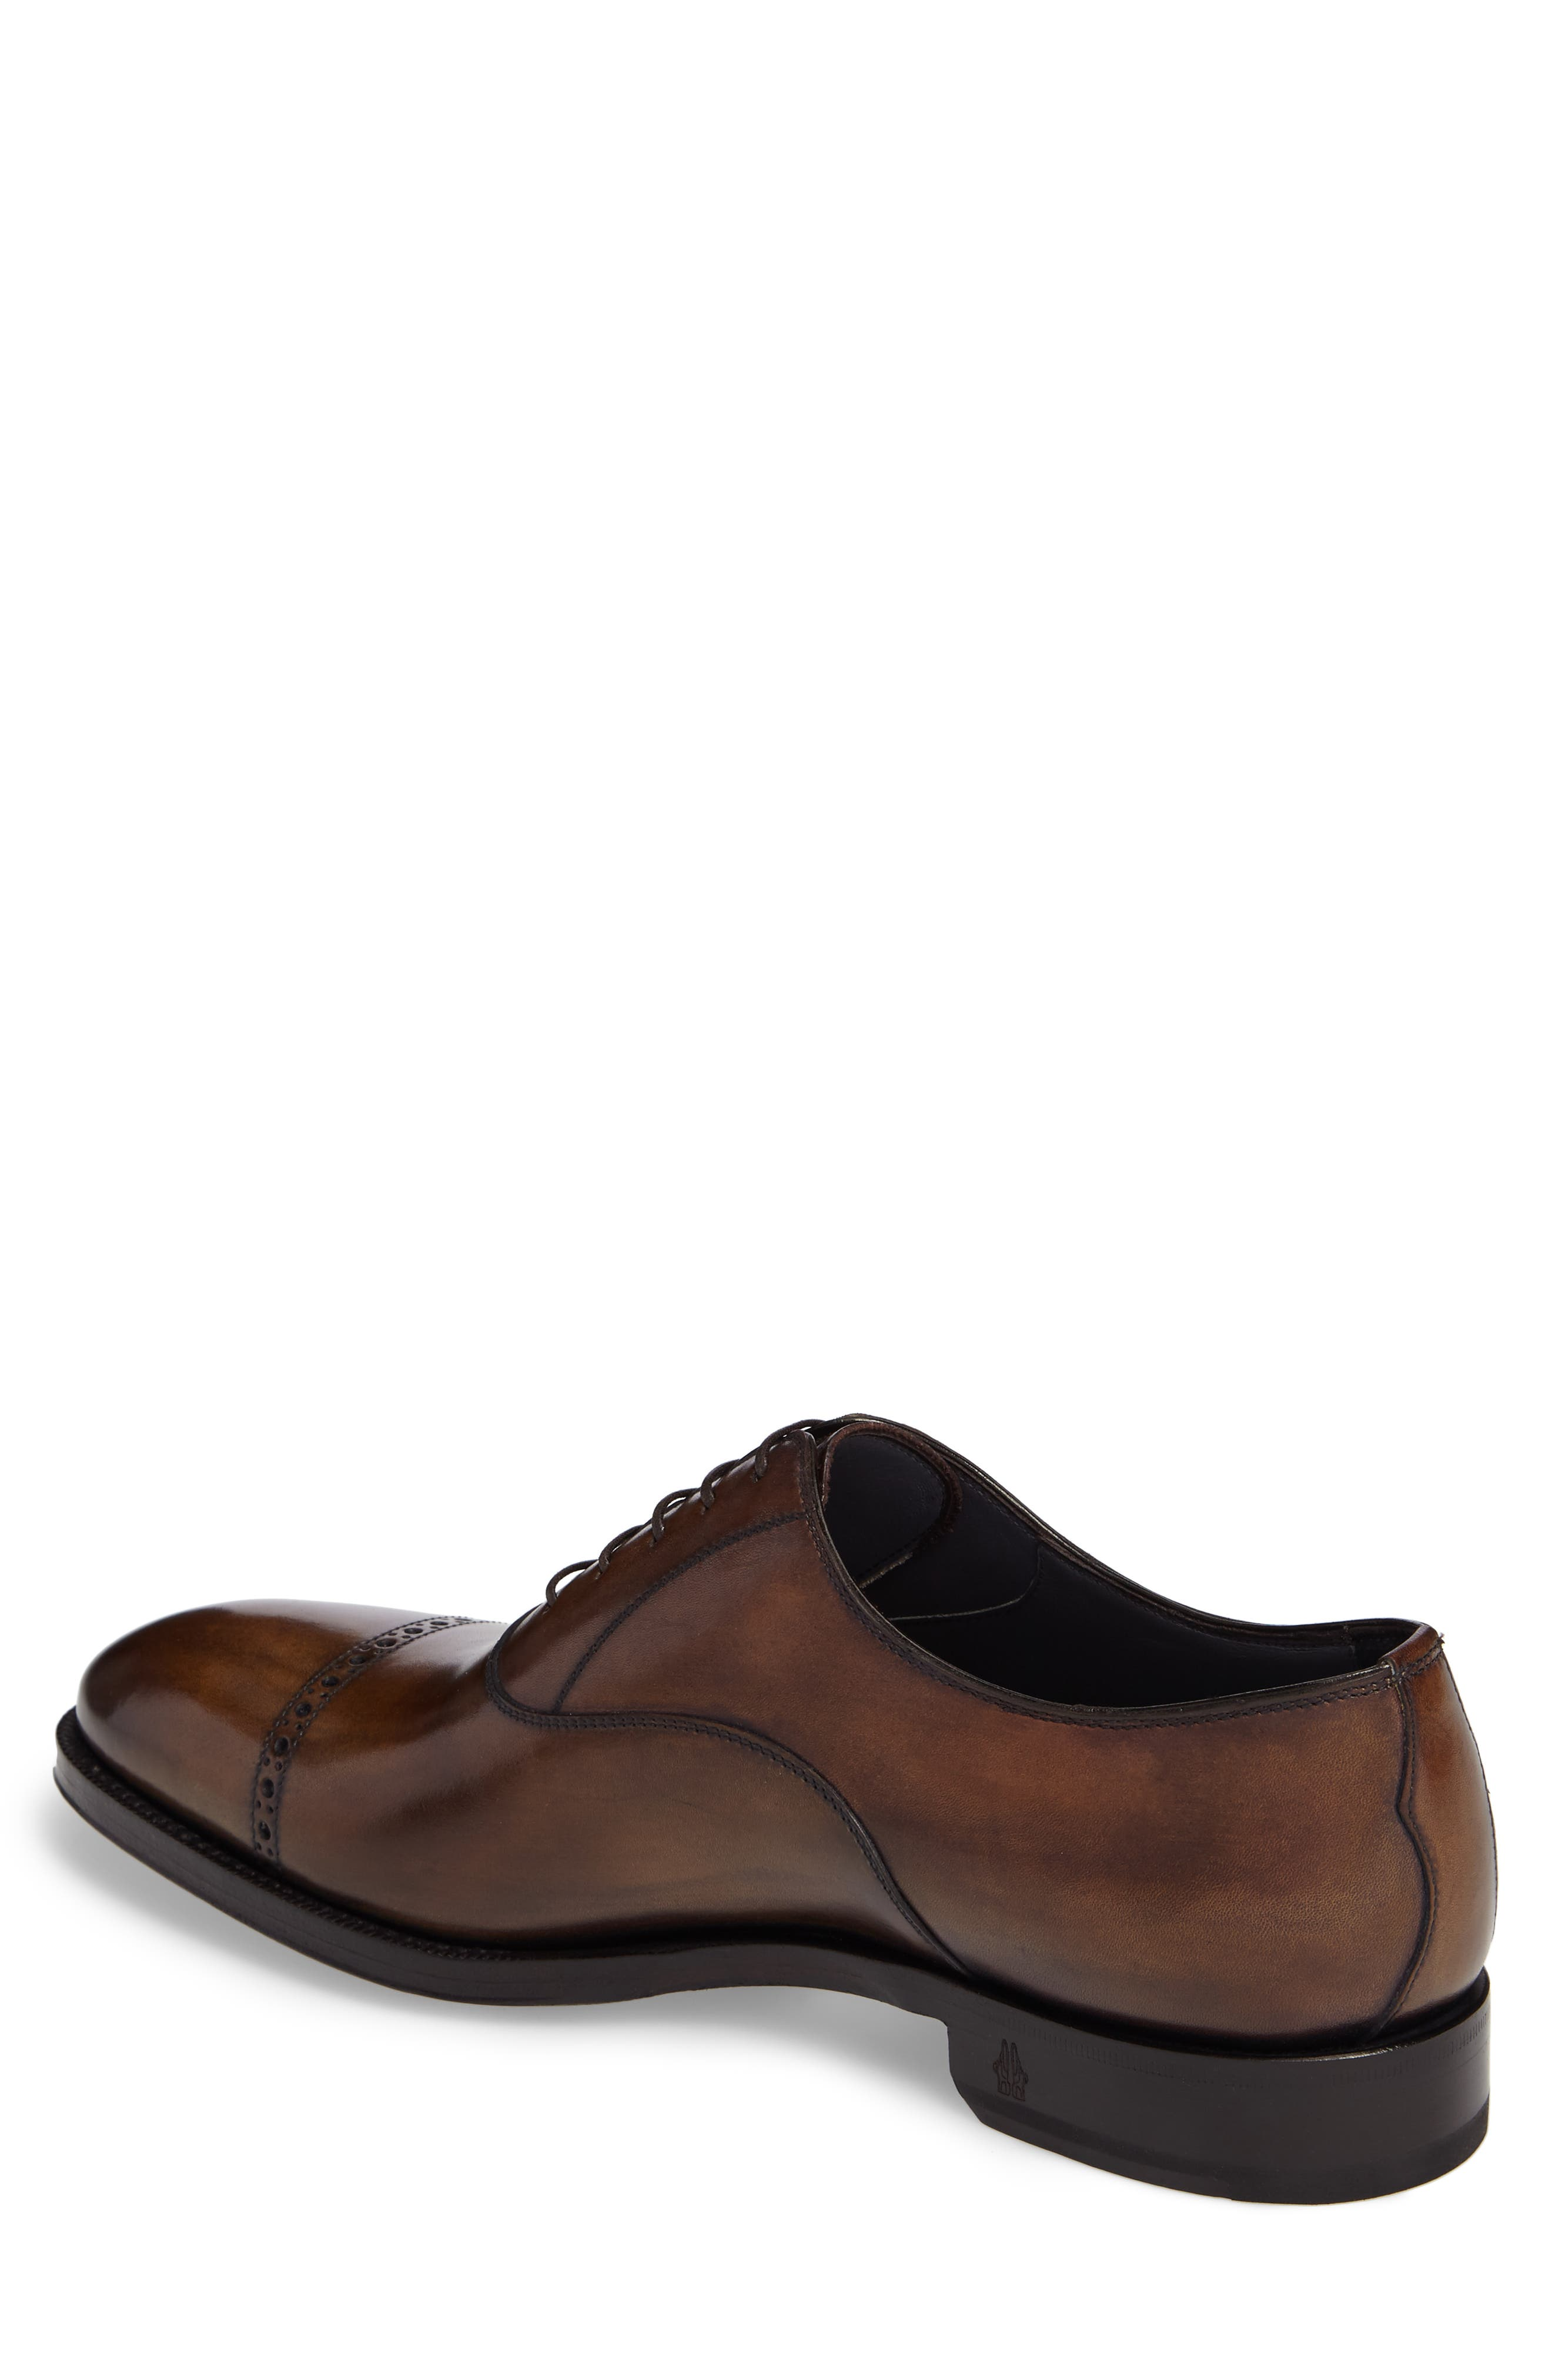 DiGallo Bianco Cap Toe Oxford,                             Alternate thumbnail 2, color,                             Zenzero Leather